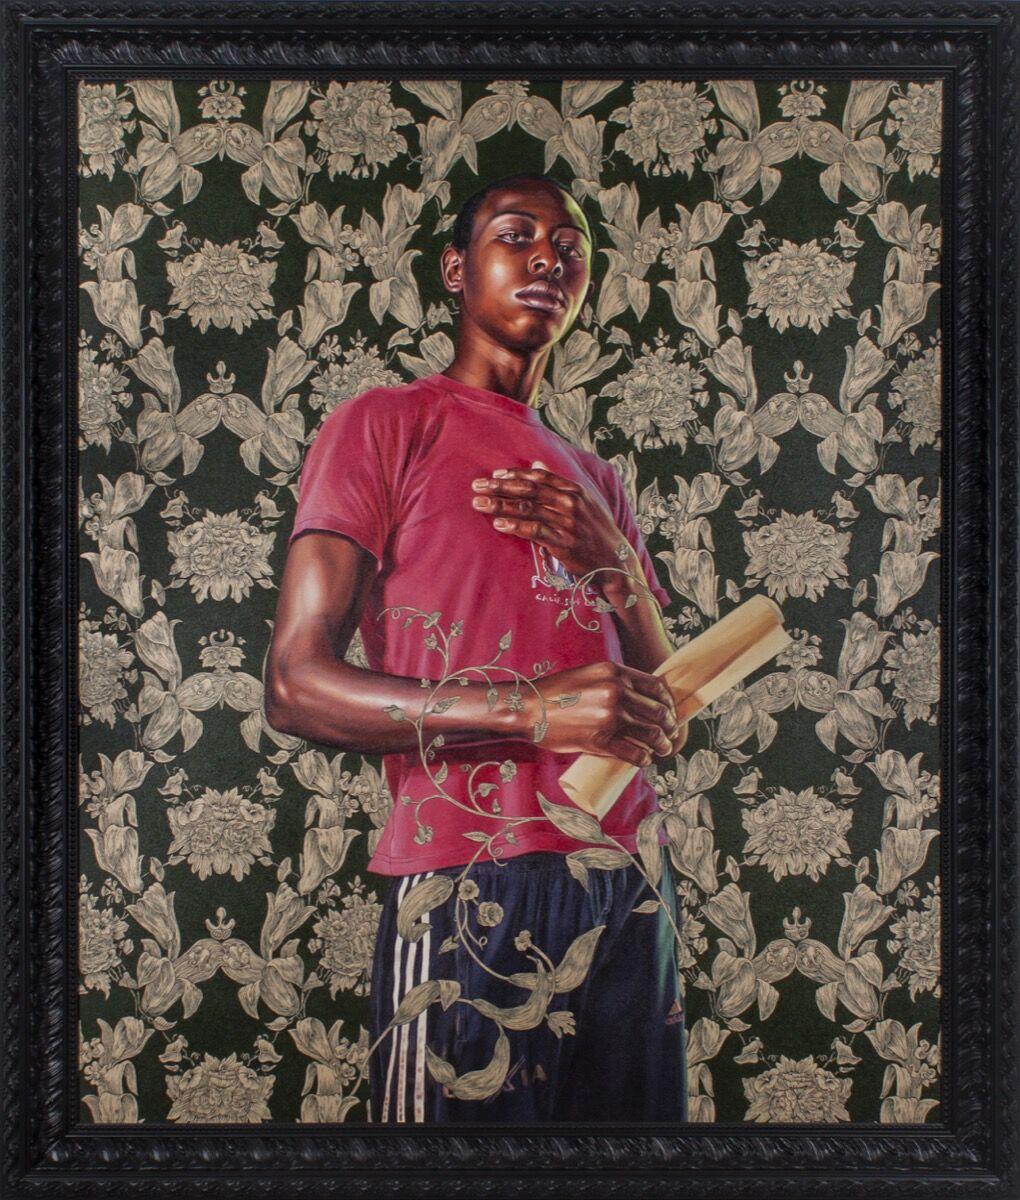 Kehinde Wiley, Portrait of Dacdjo Ndie Joseph, 2015. Courtesy of Berggruen Gallery, San Francisco.